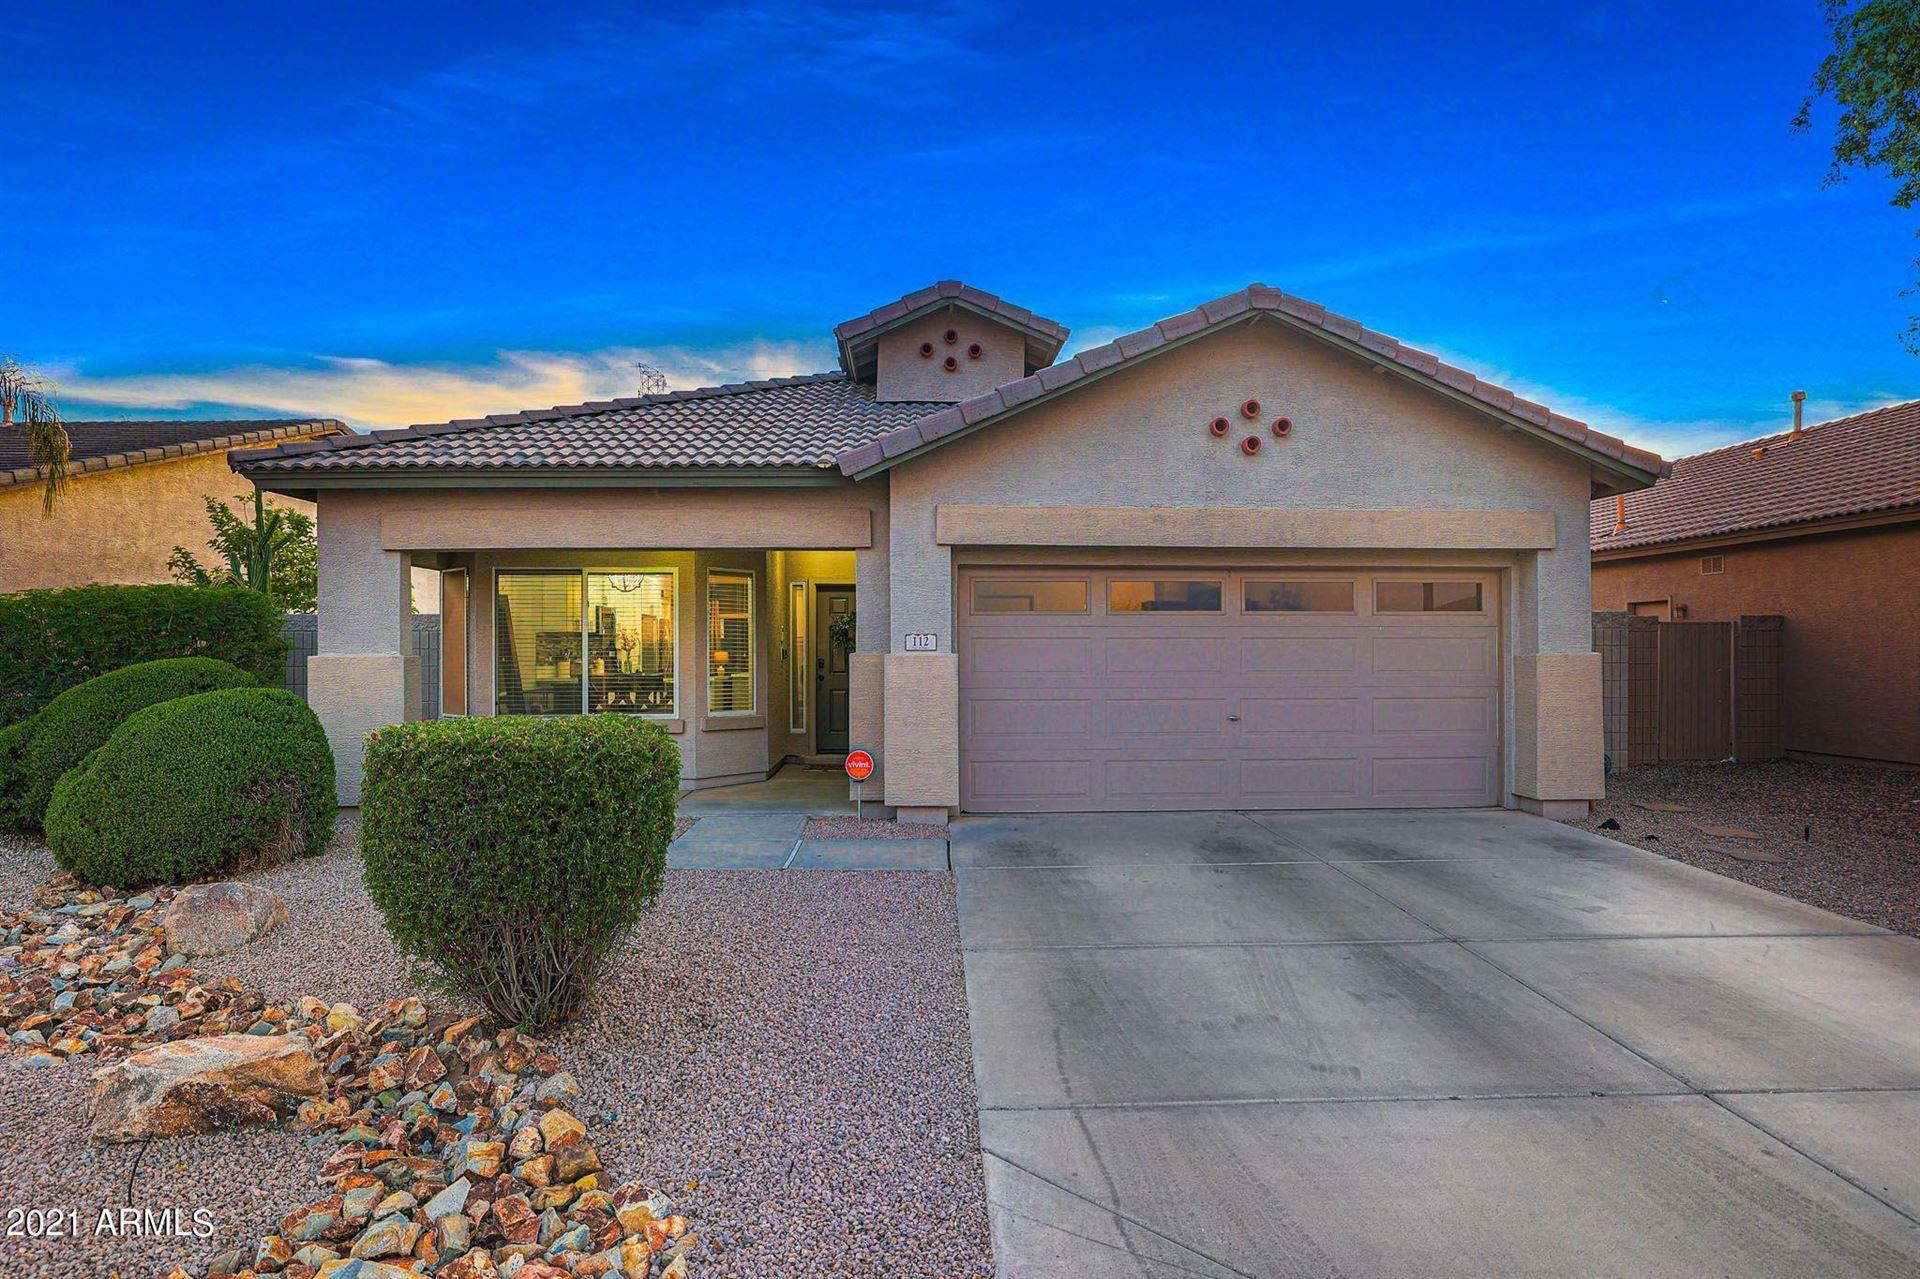 112 S 120TH Avenue, Avondale, AZ 85323 - MLS#: 6271705